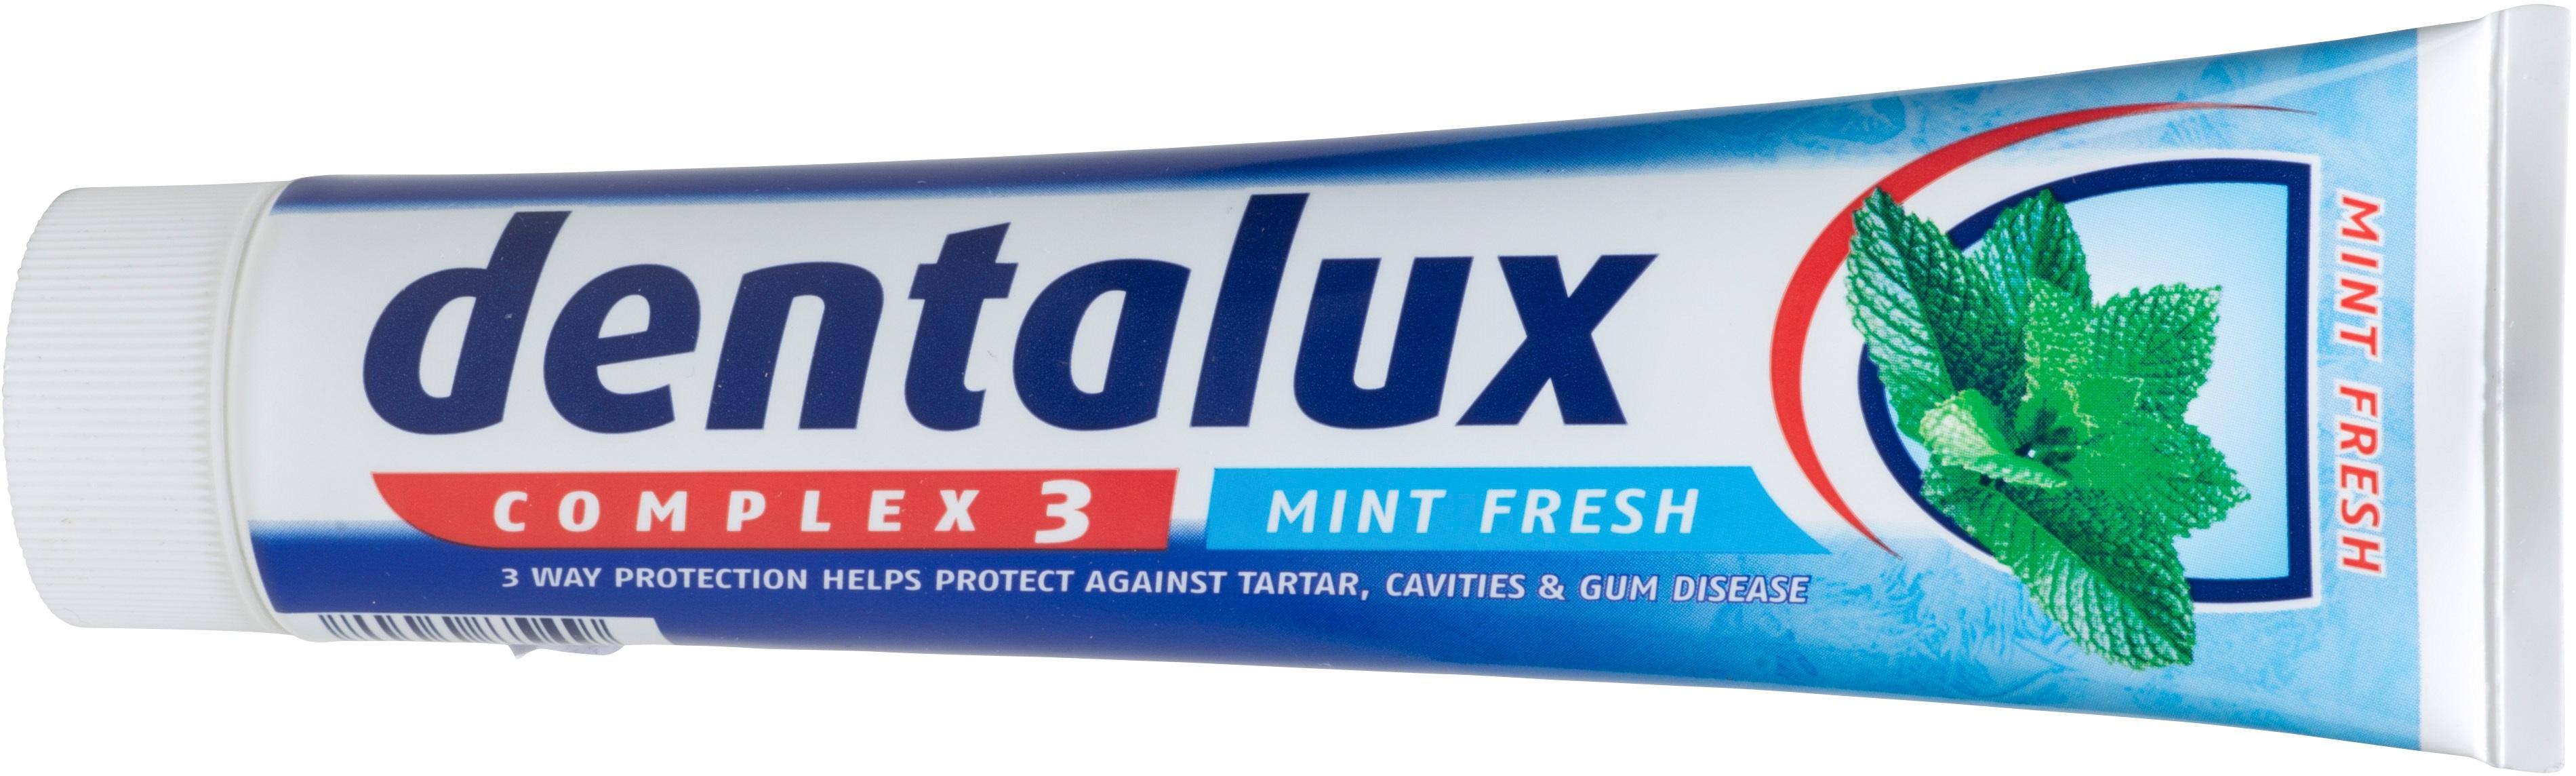 Whitening-tandpastas-DENTALUX-LIDL-Complex-3-Mint-fresh-zoom_medium.jpg